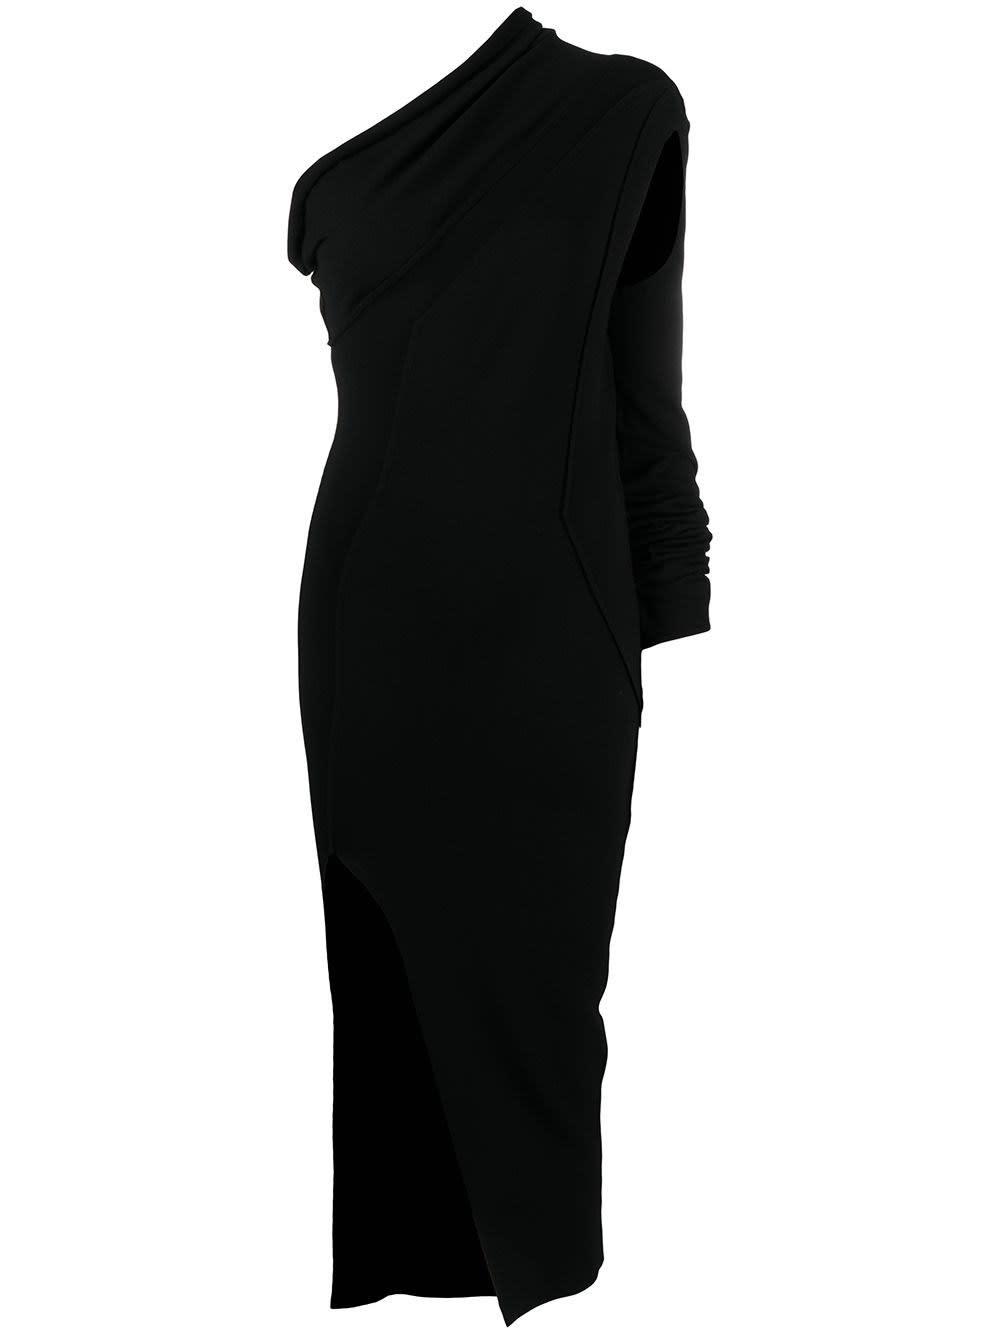 Rick Owens ATHENA LONG DRESS IN BLACK KNIT